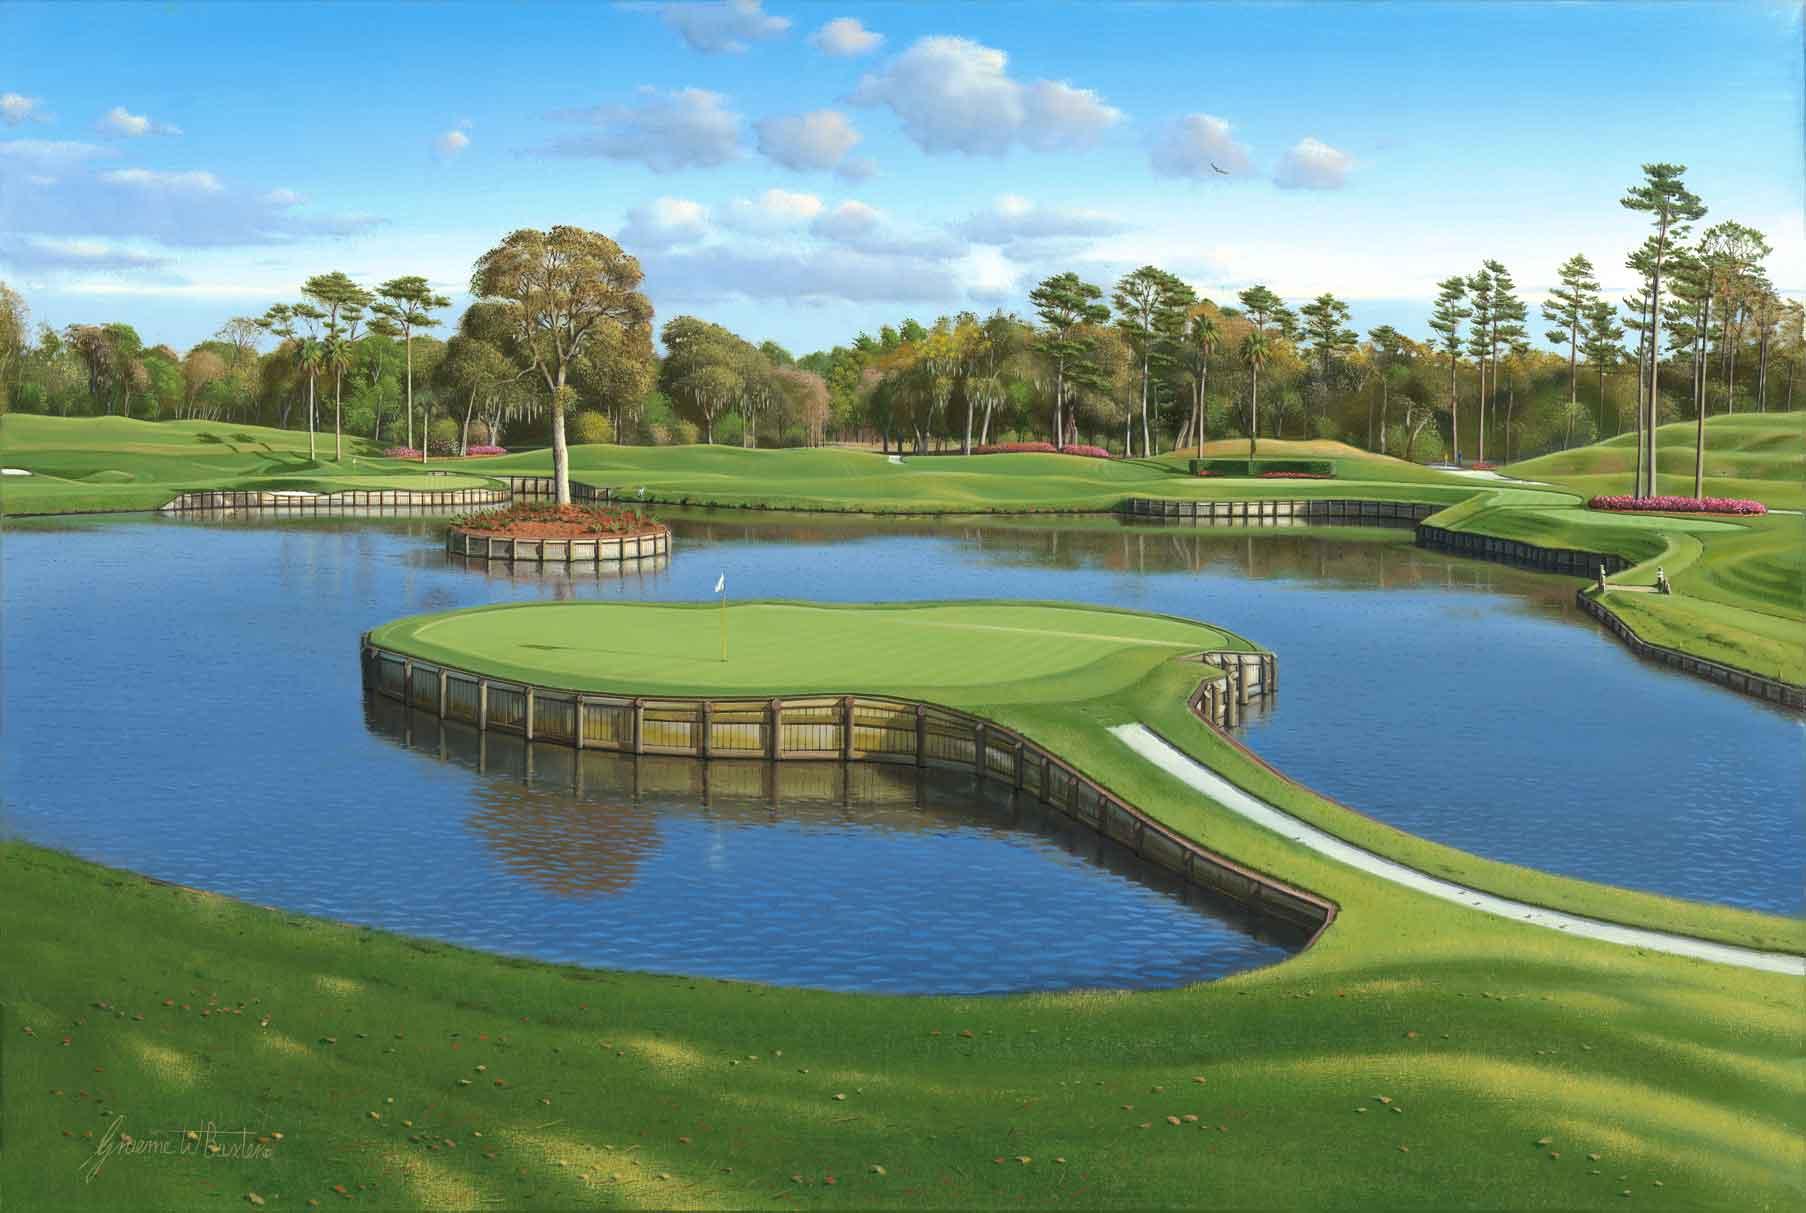 URL httpimagescicomfamous golf holes 1645 hd wallpapershtml 1806x1213